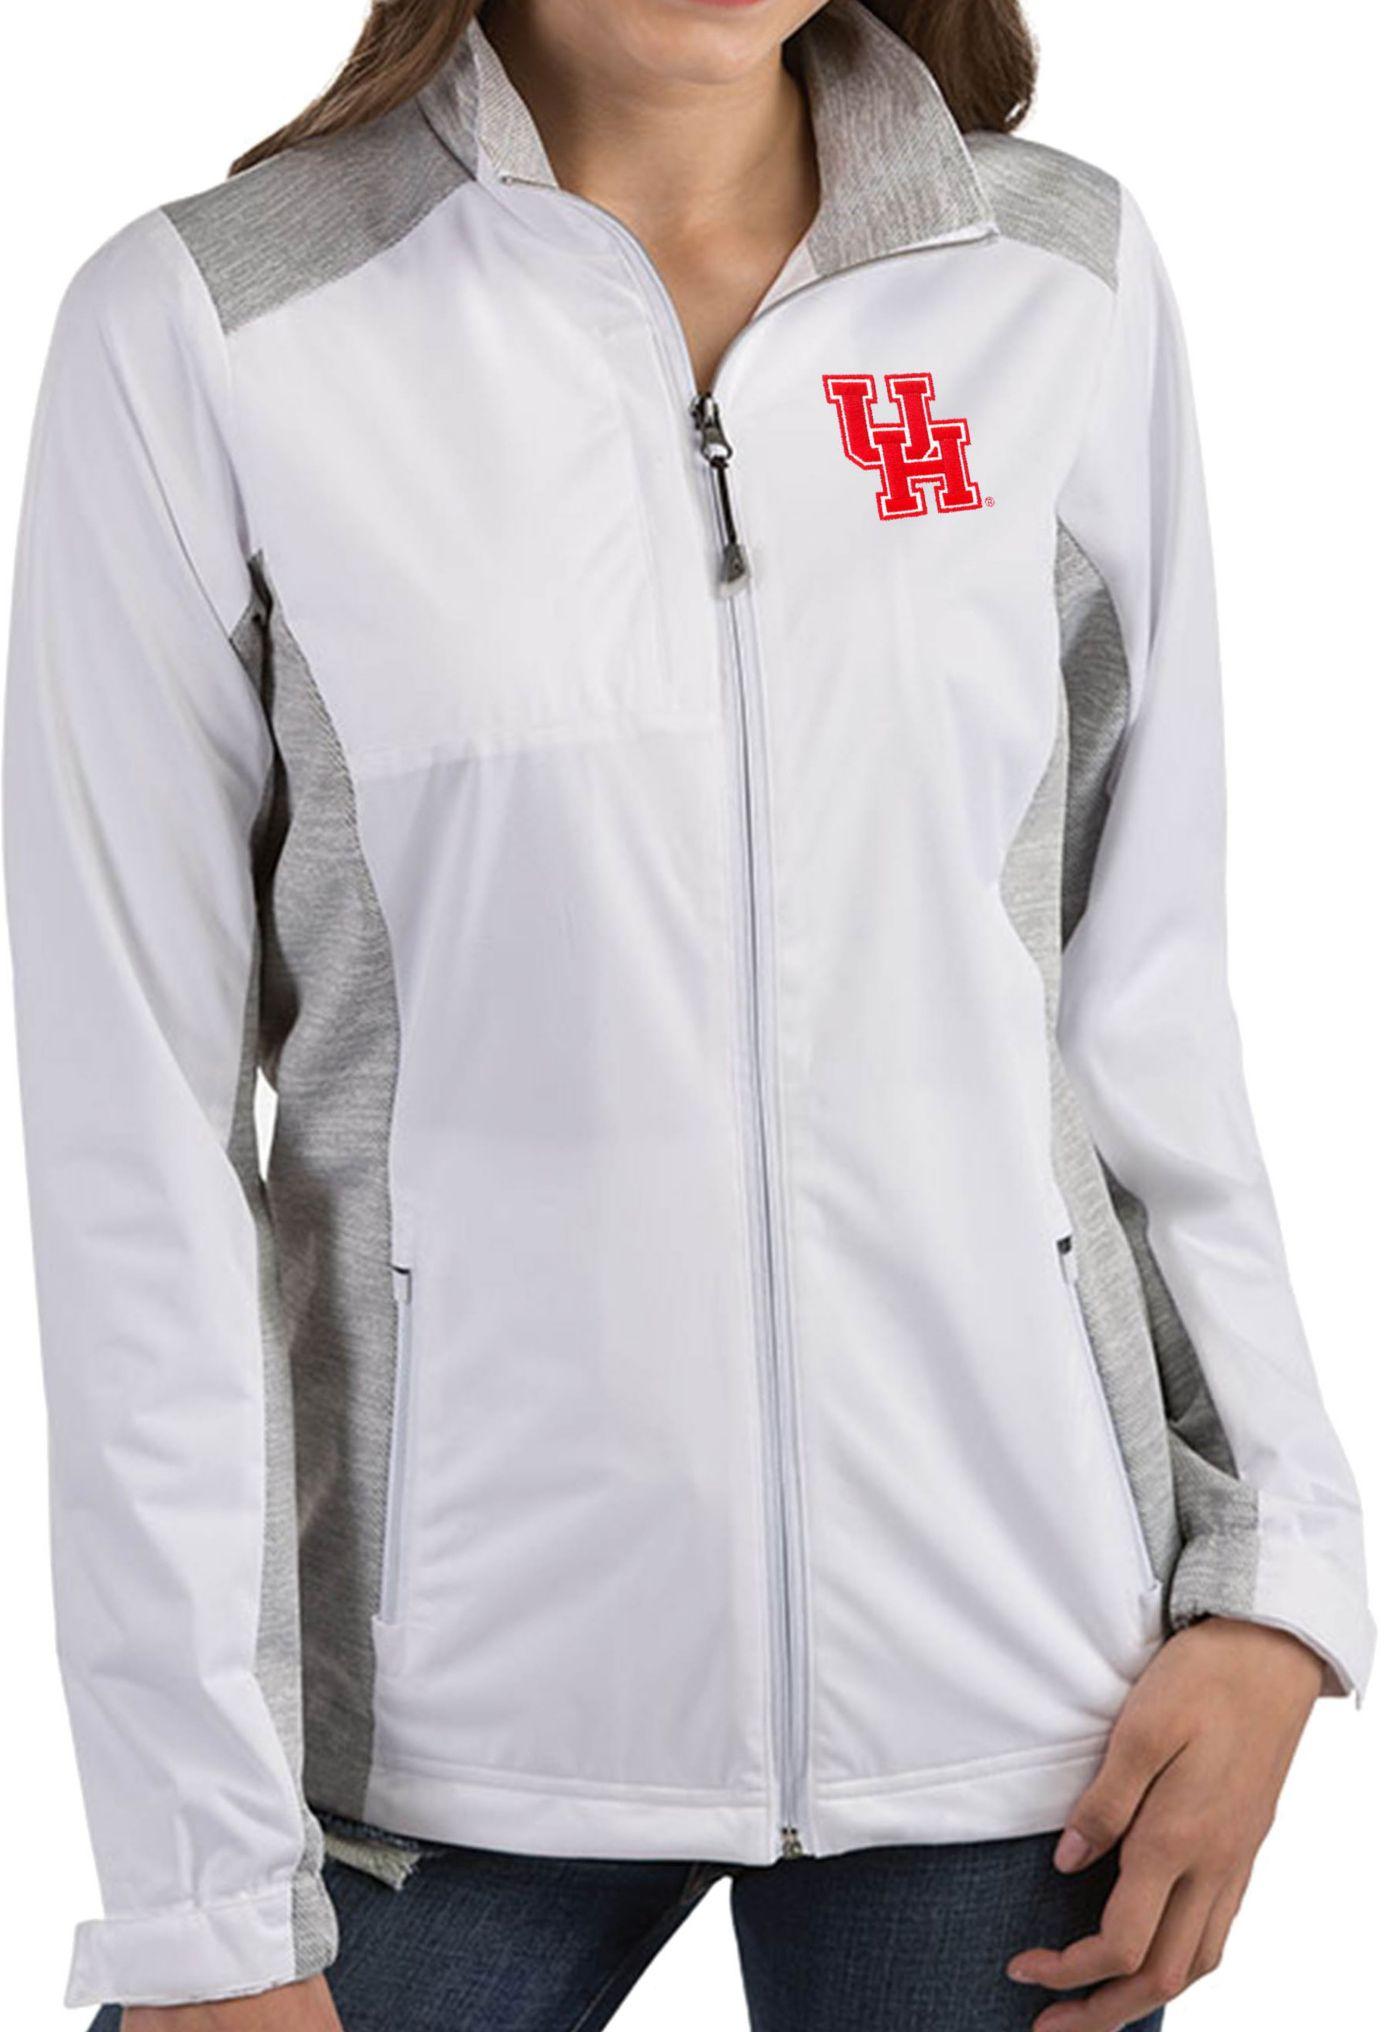 Antigua Women's Houston Cougars Revolve Full-Zip White Jacket